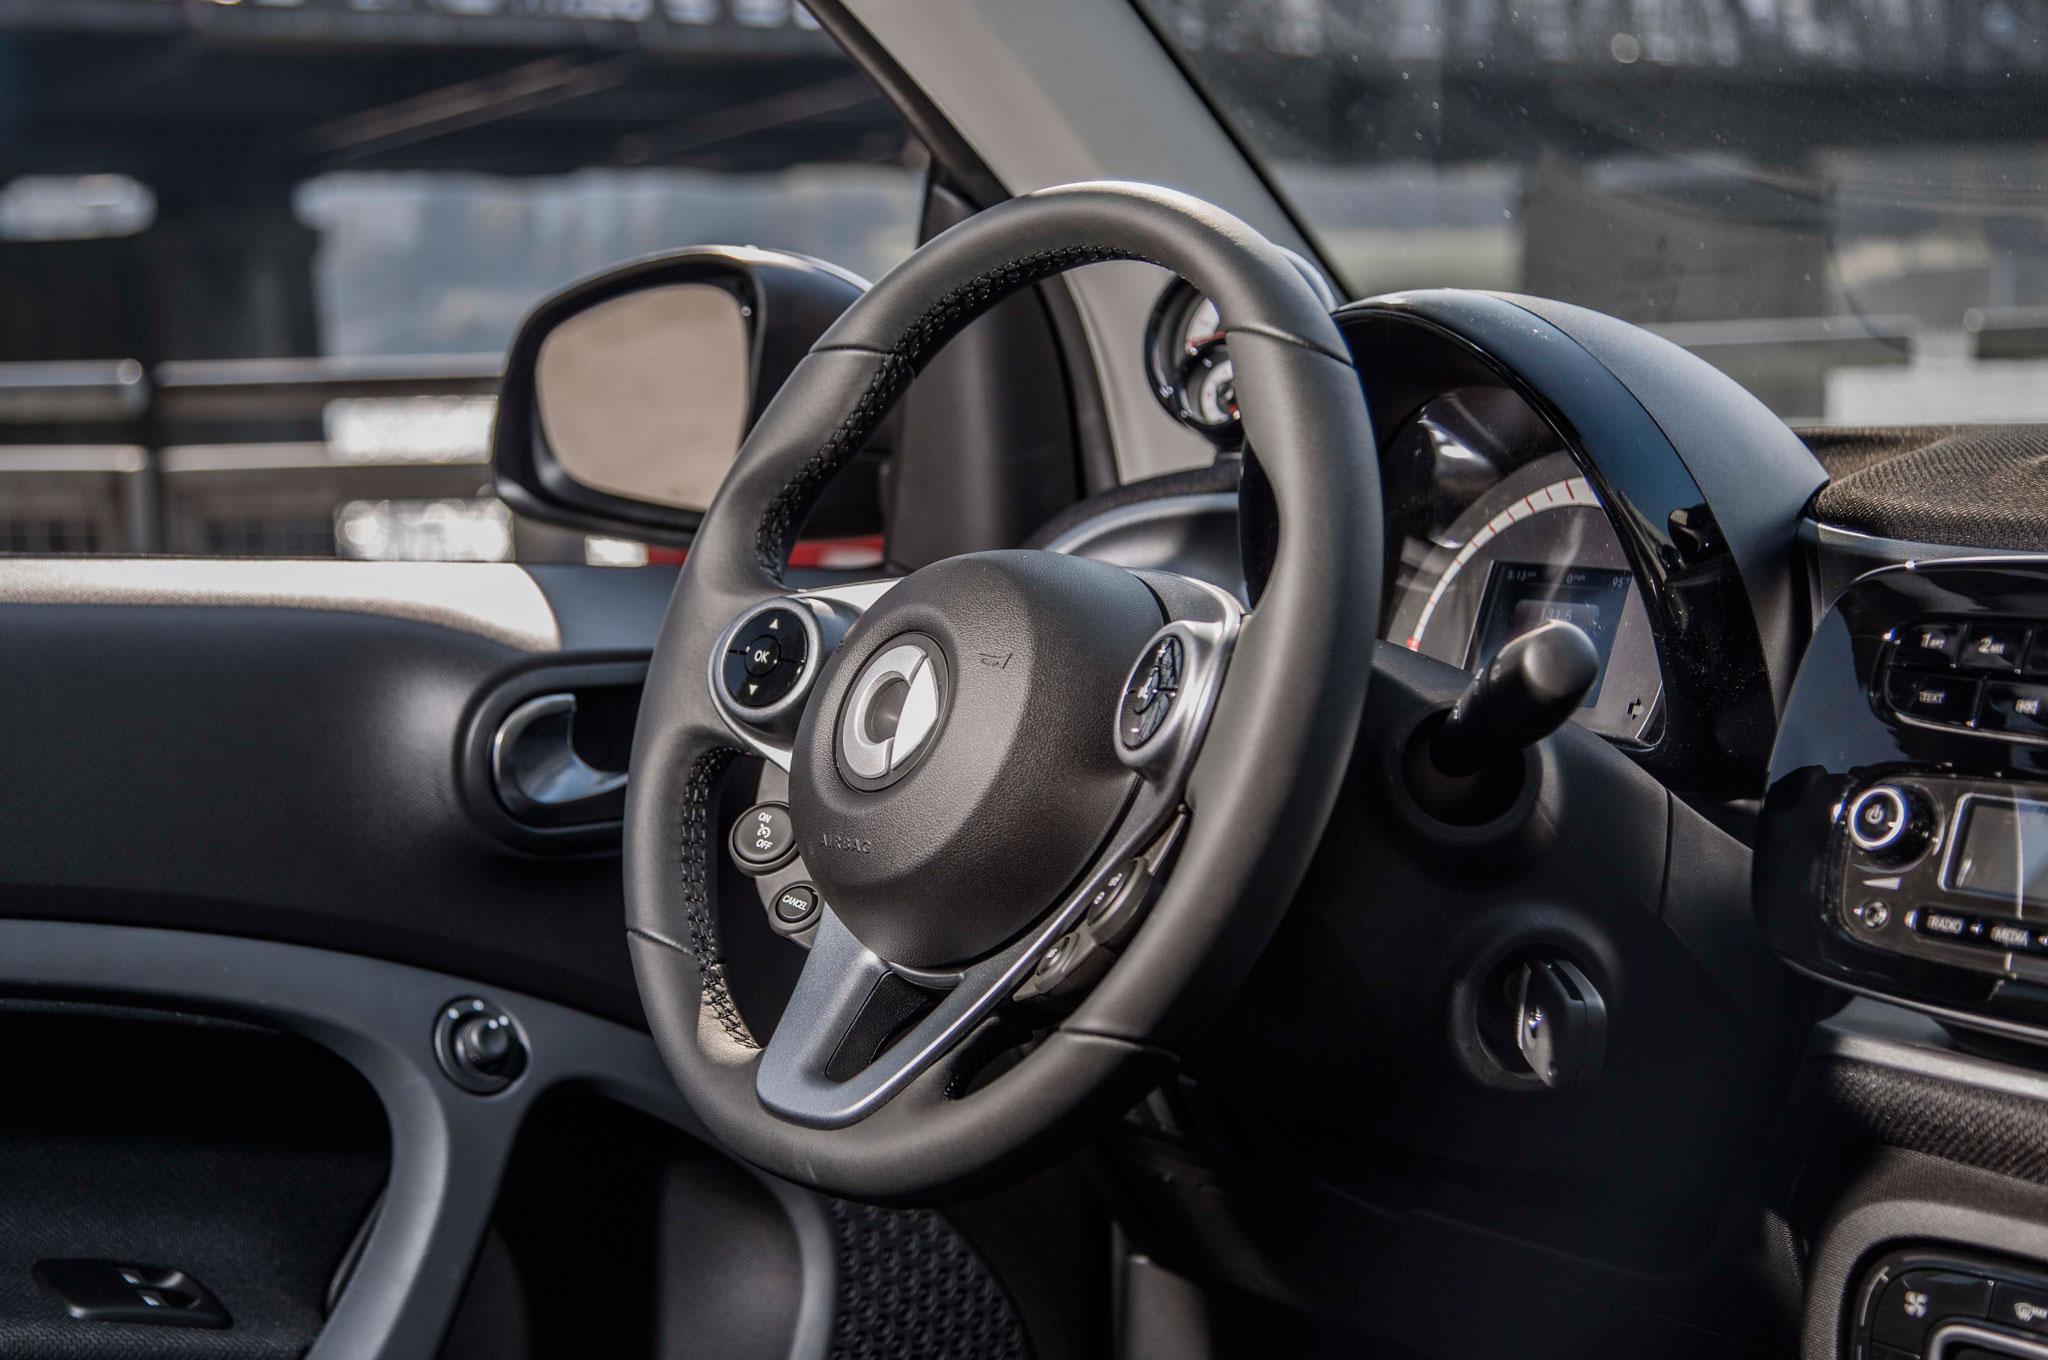 2016 Smart Fortwo Steering Wheel